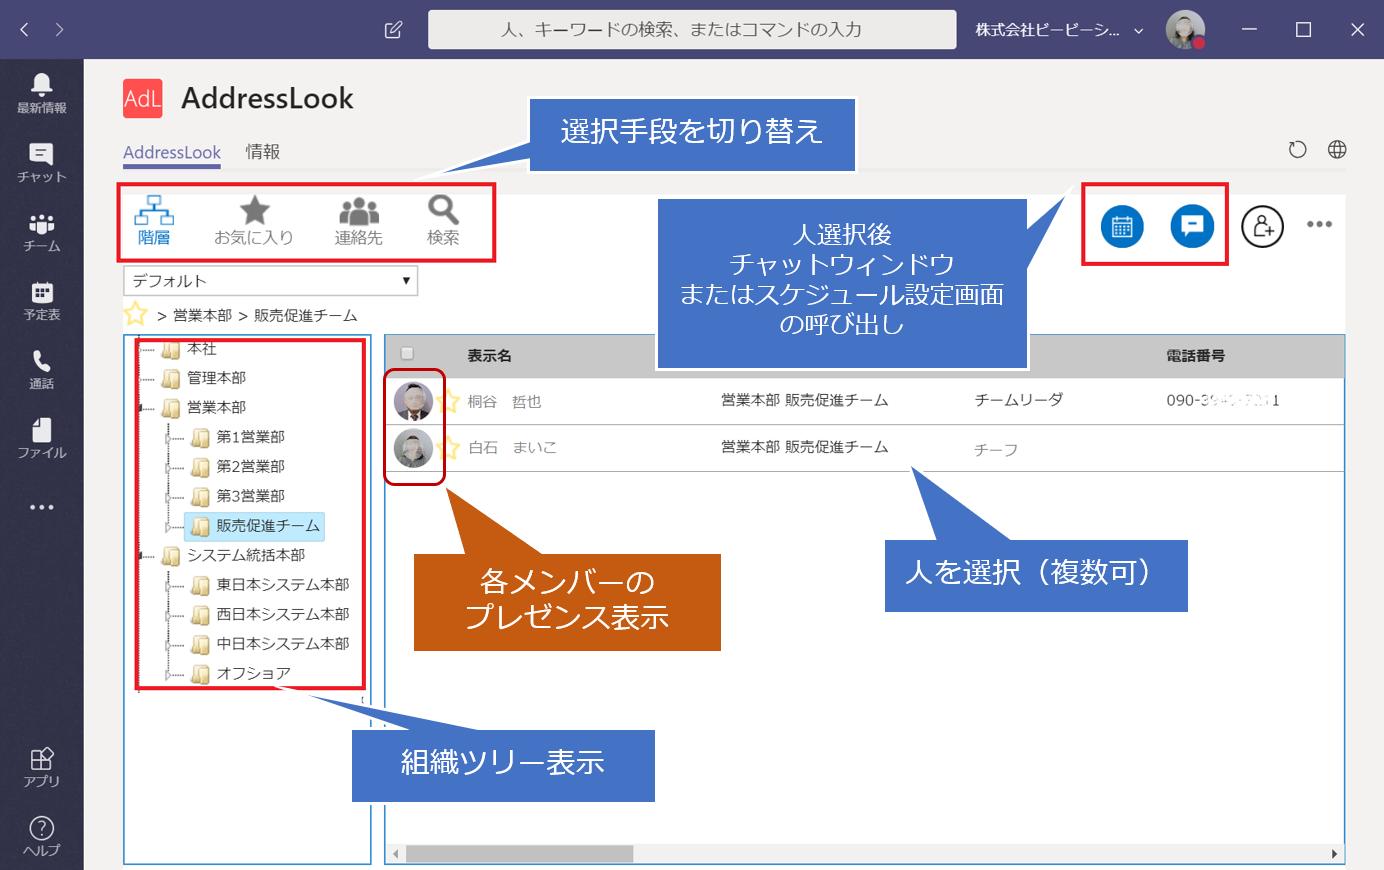 「Microsoft Teams」 で「階層型アドレス帳」が使える『AddressLook for Microsoft Teams』が機能強化